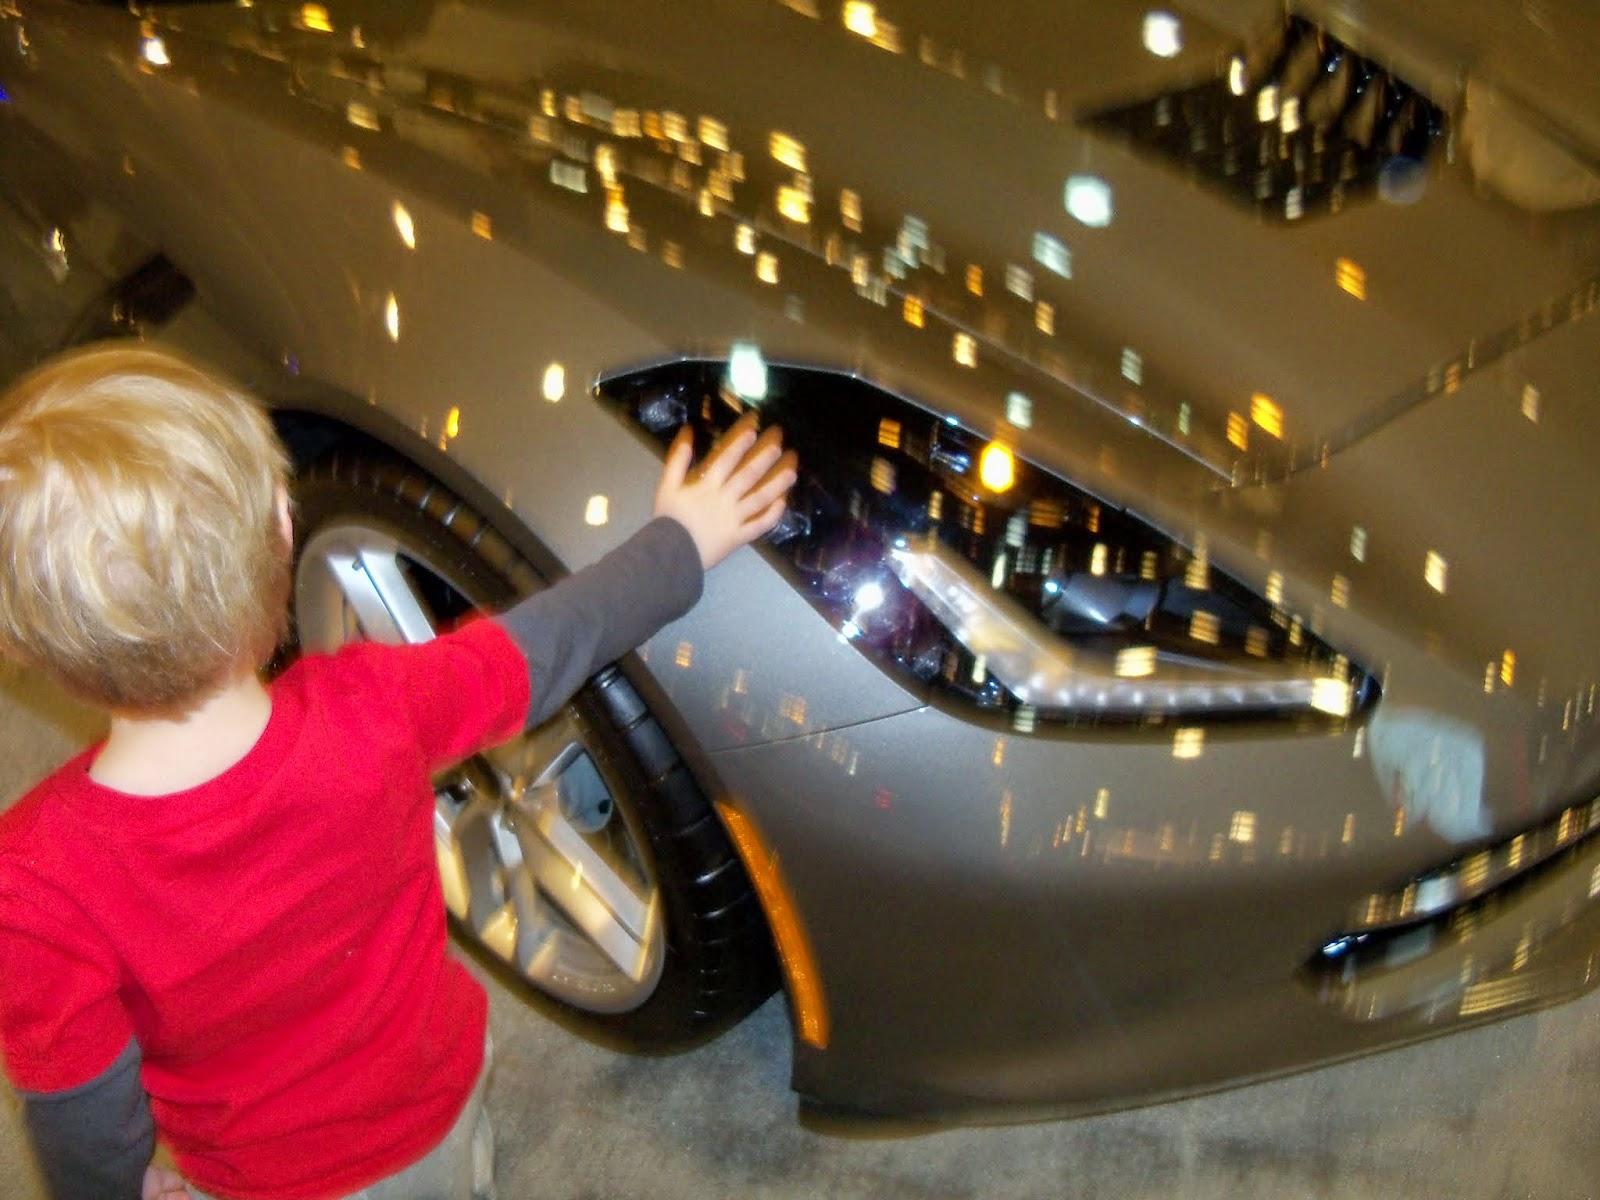 Houston Auto Show 2015 - 116_7269.JPG